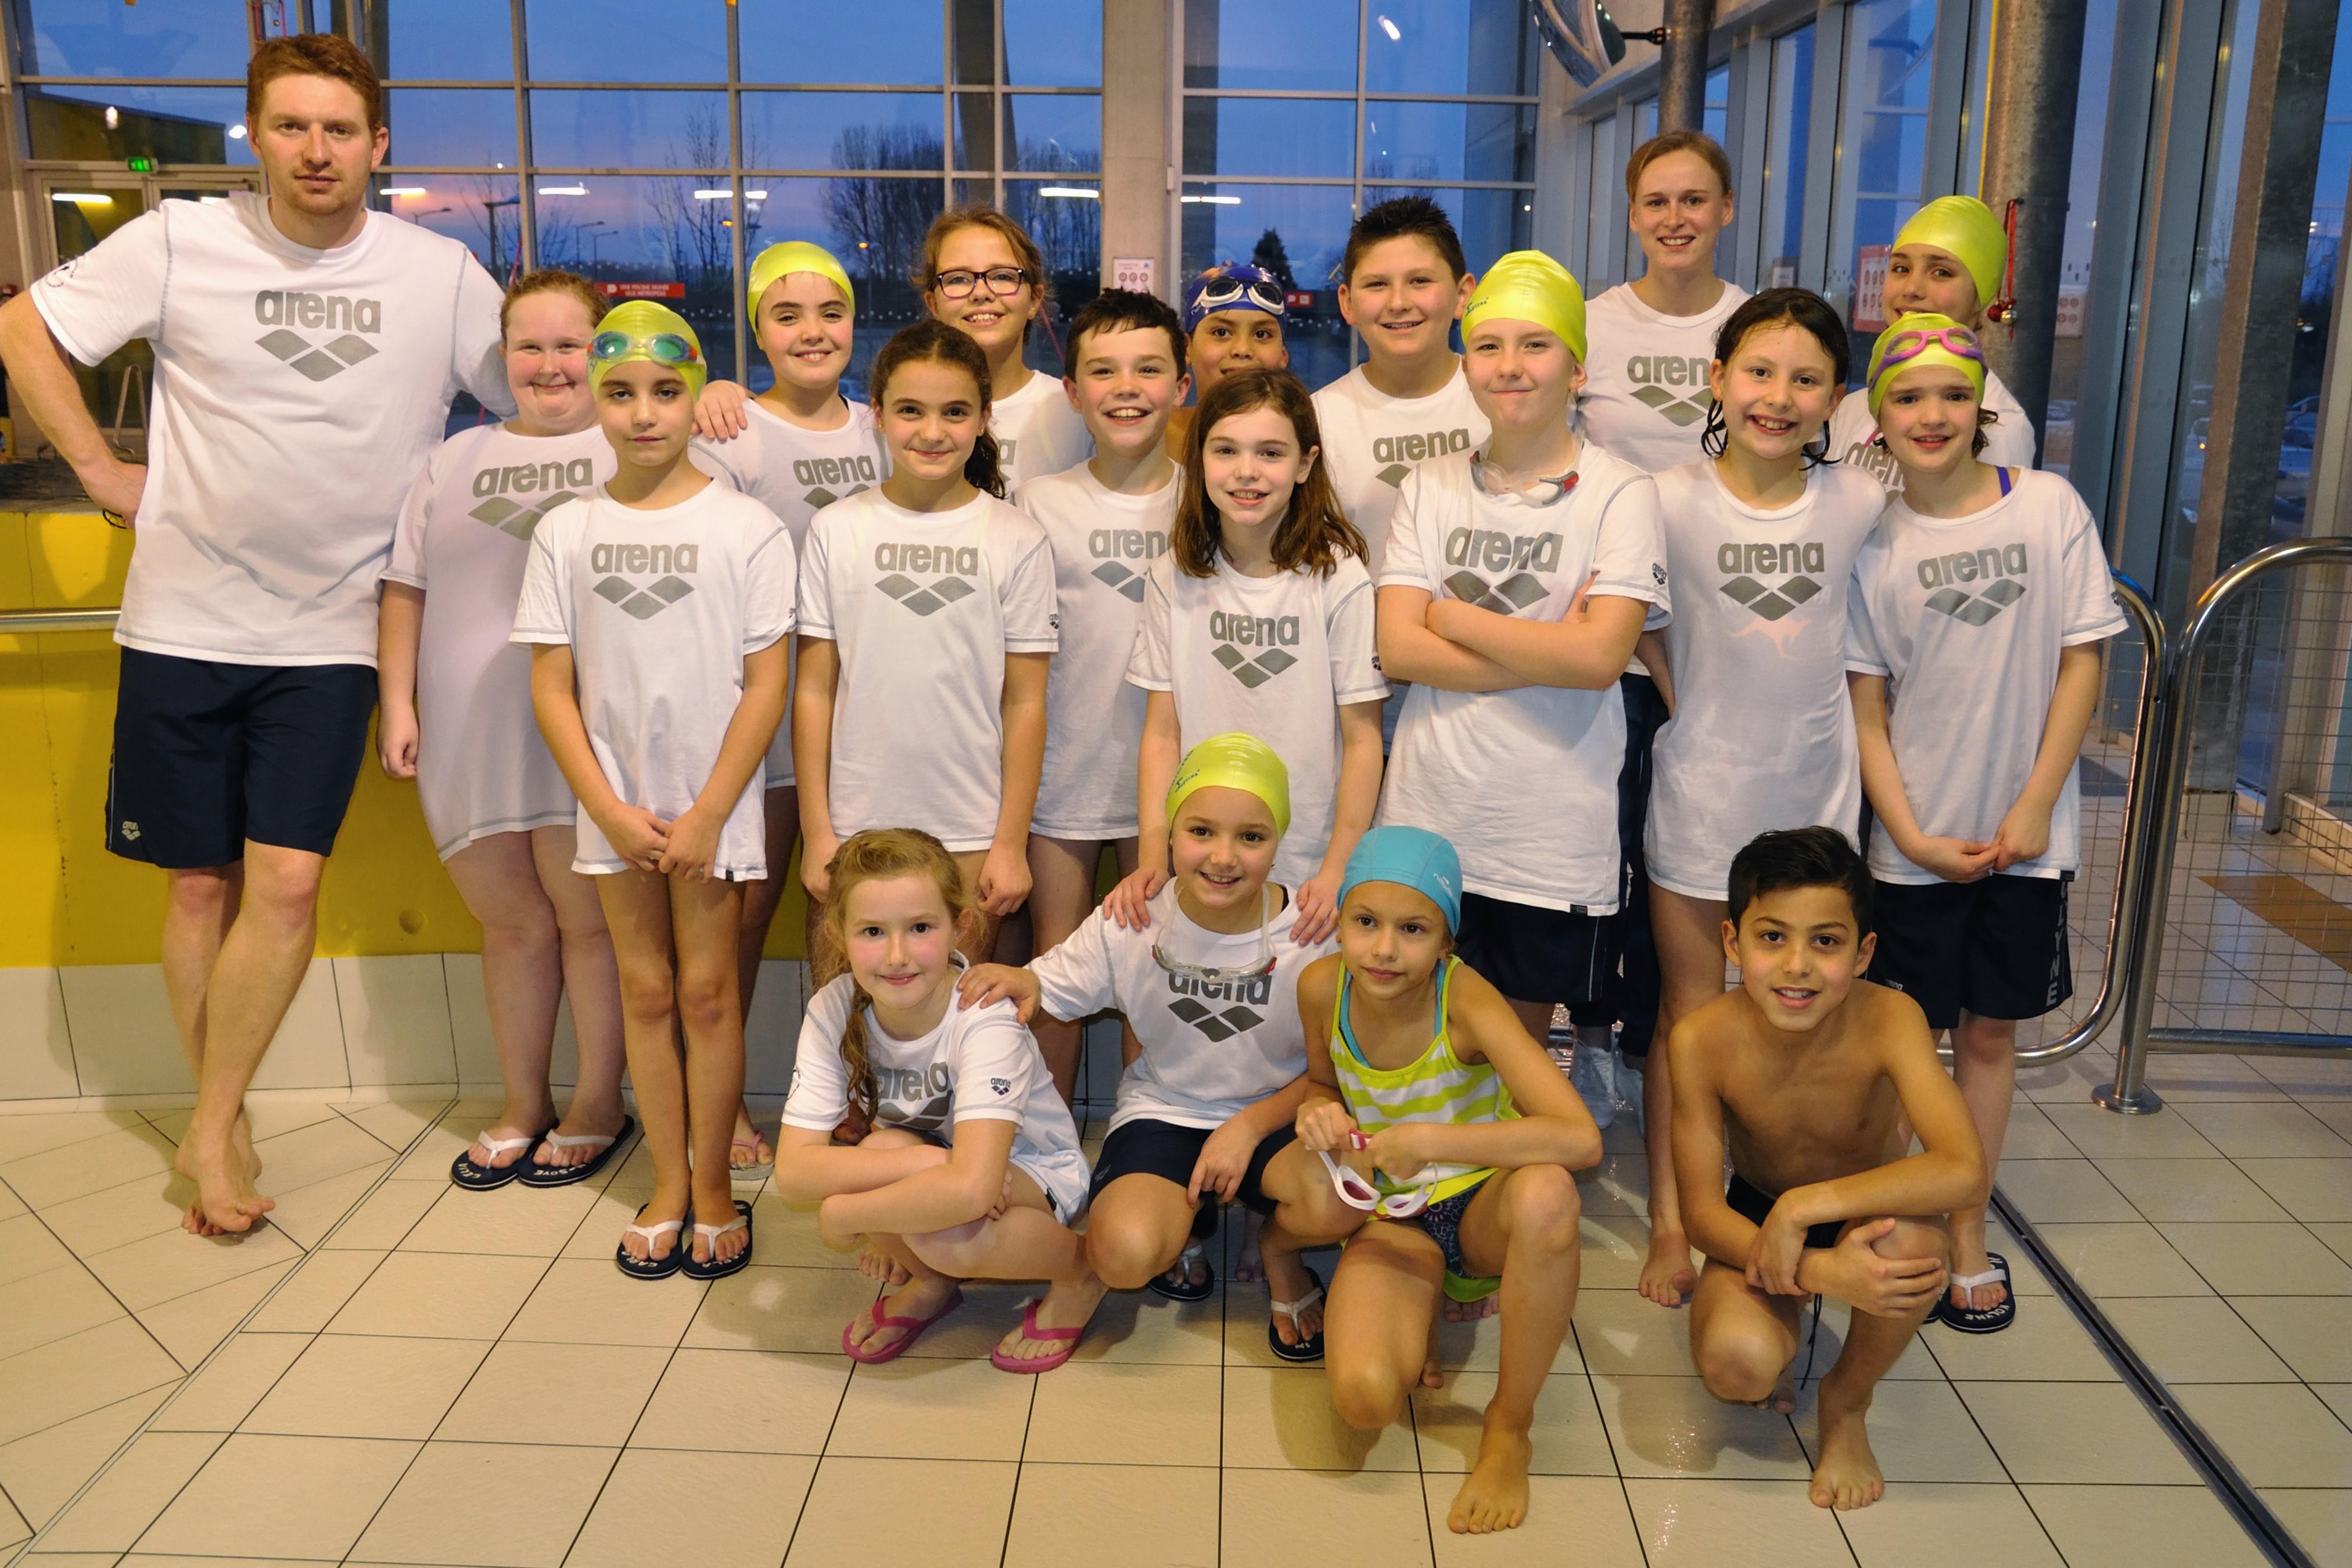 Dauphins wattrelos natation 2 eme journ e avenirs for Piscine herlies